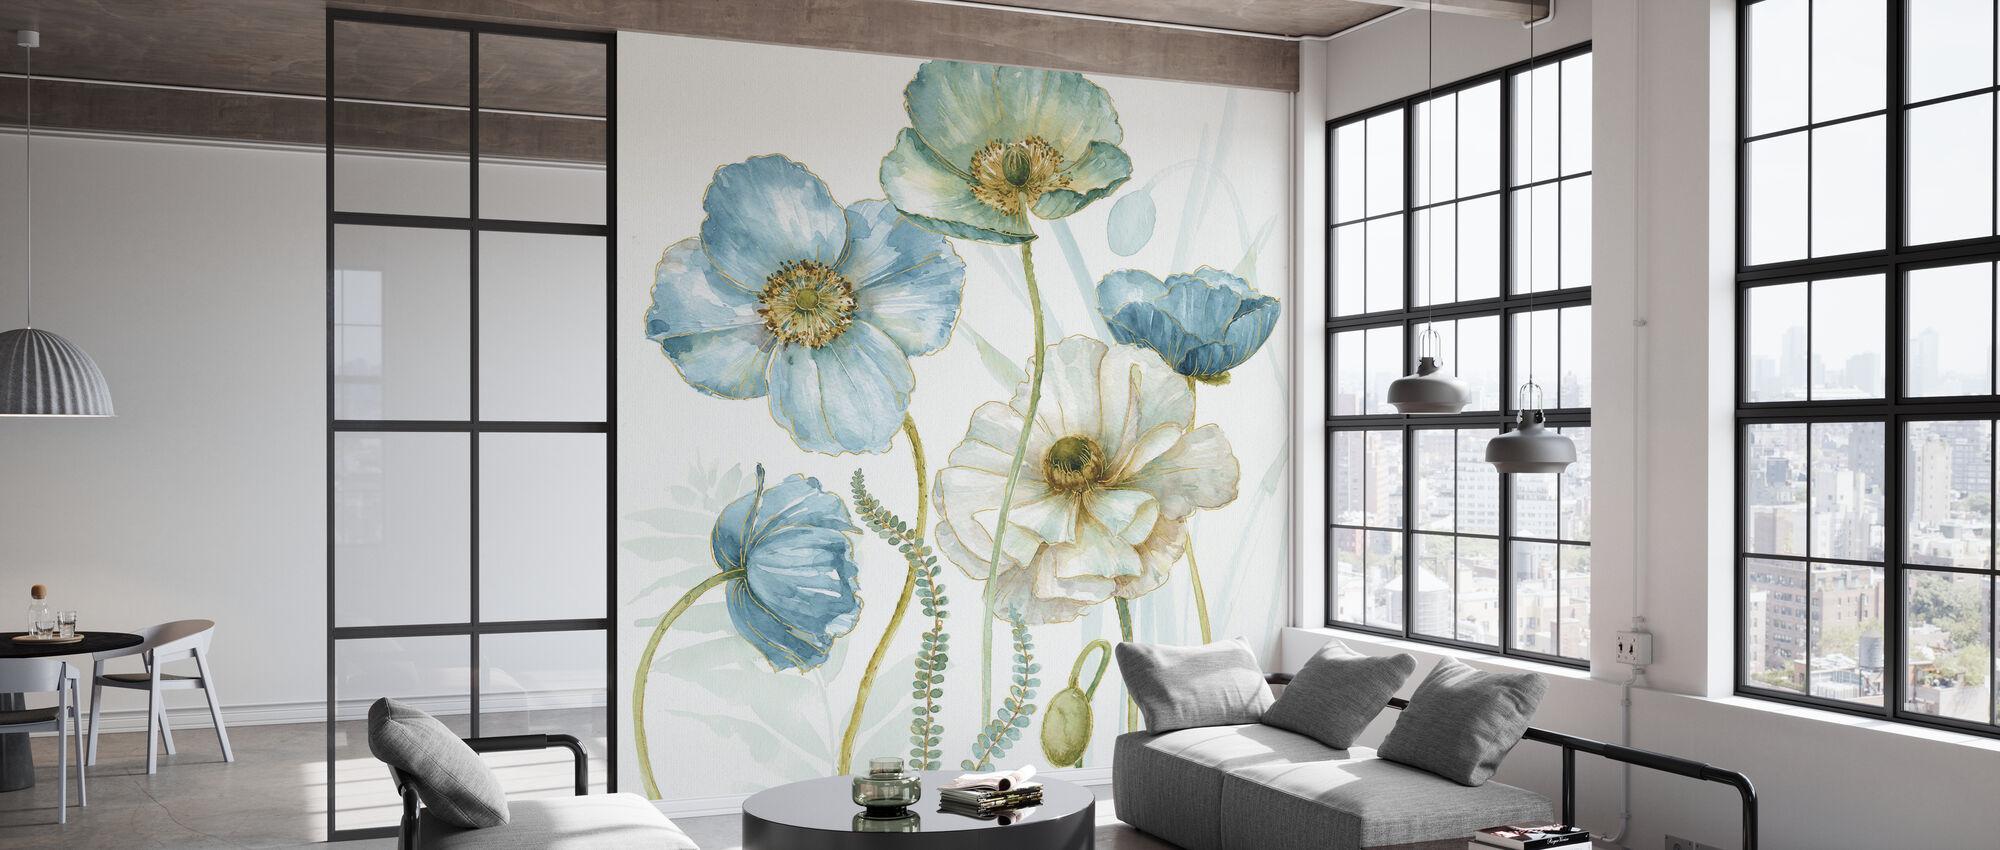 My Greenhouse Flowers 5 - Wallpaper - Office